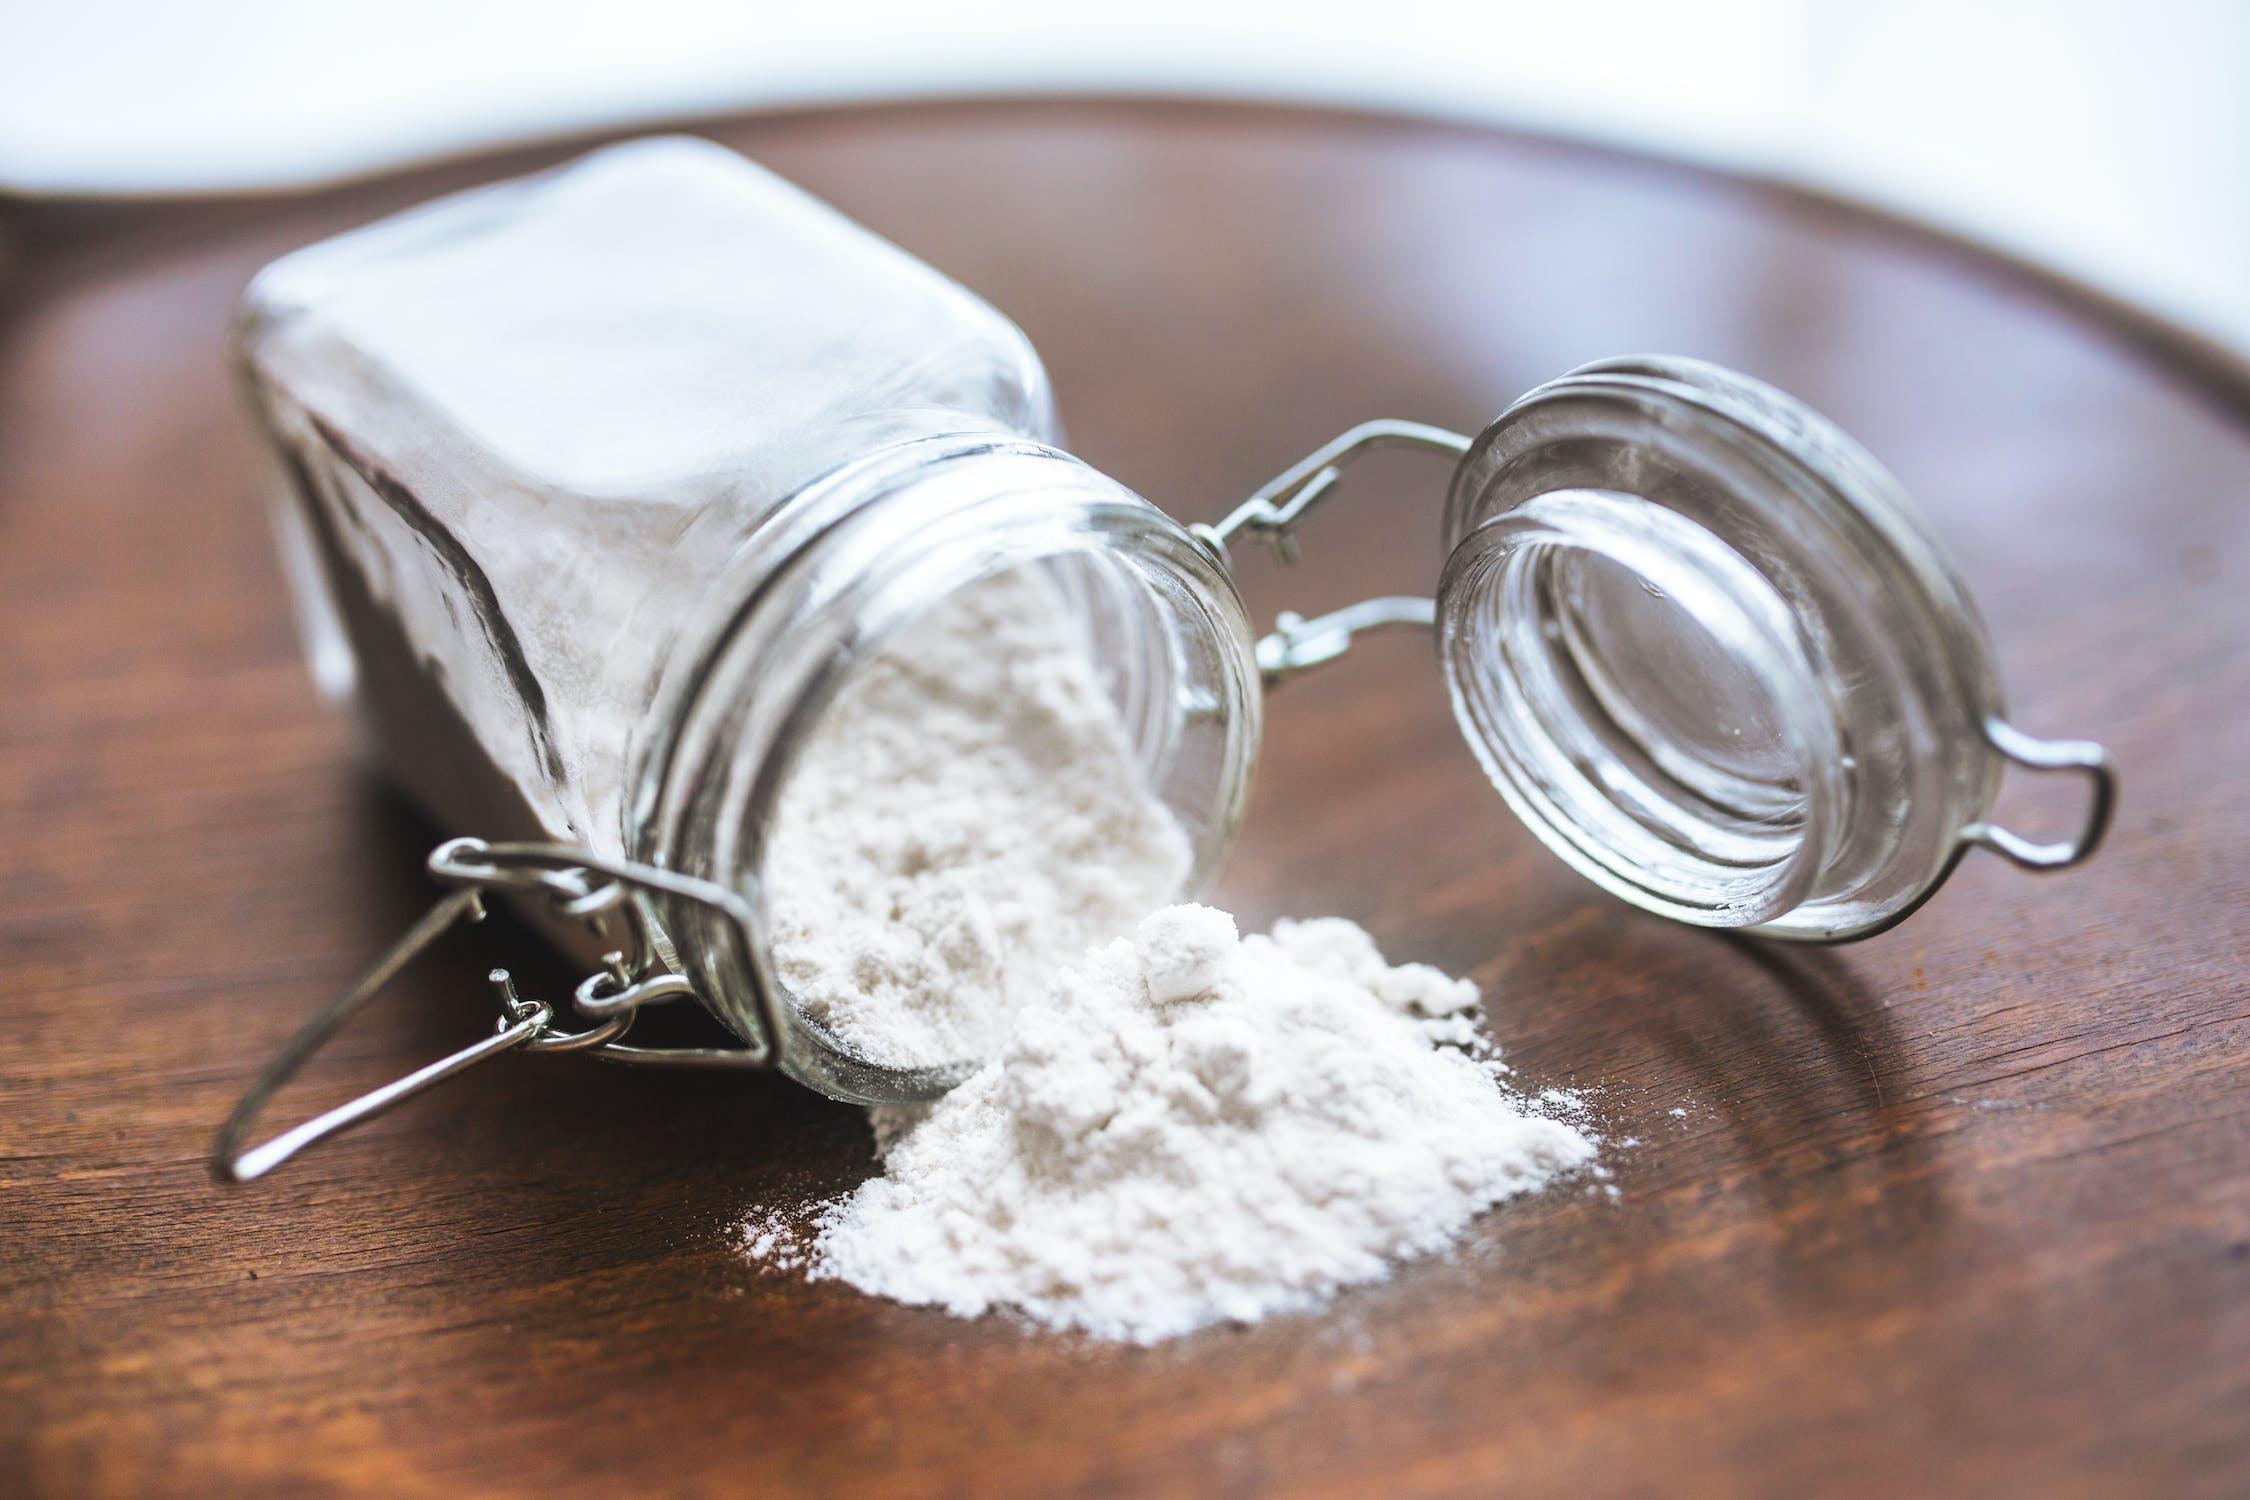 homemade dandruff treatments